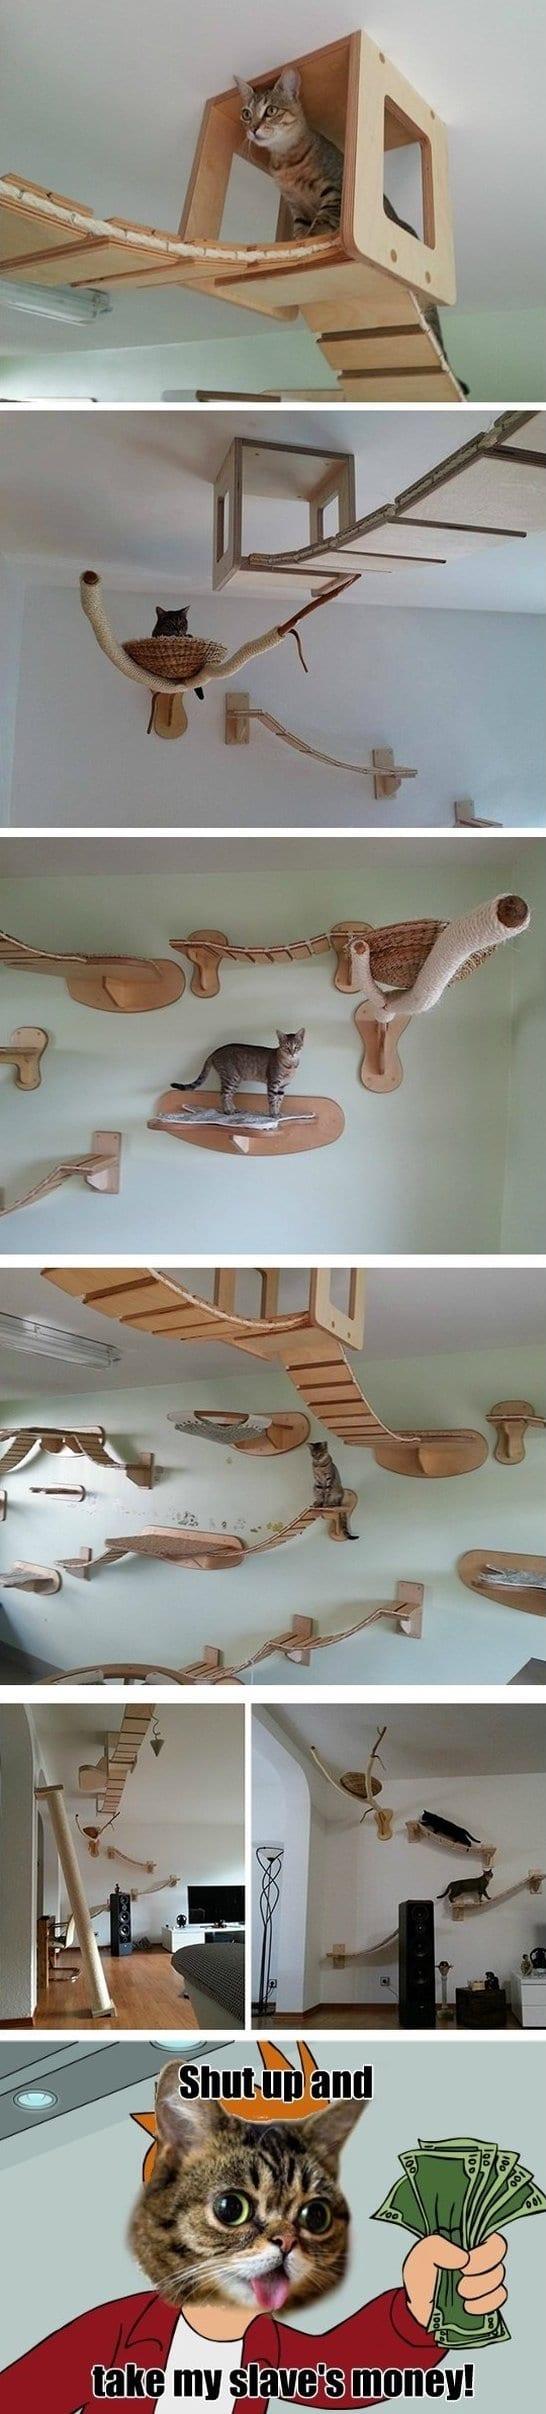 funny-cat-furniture-meme-jokes